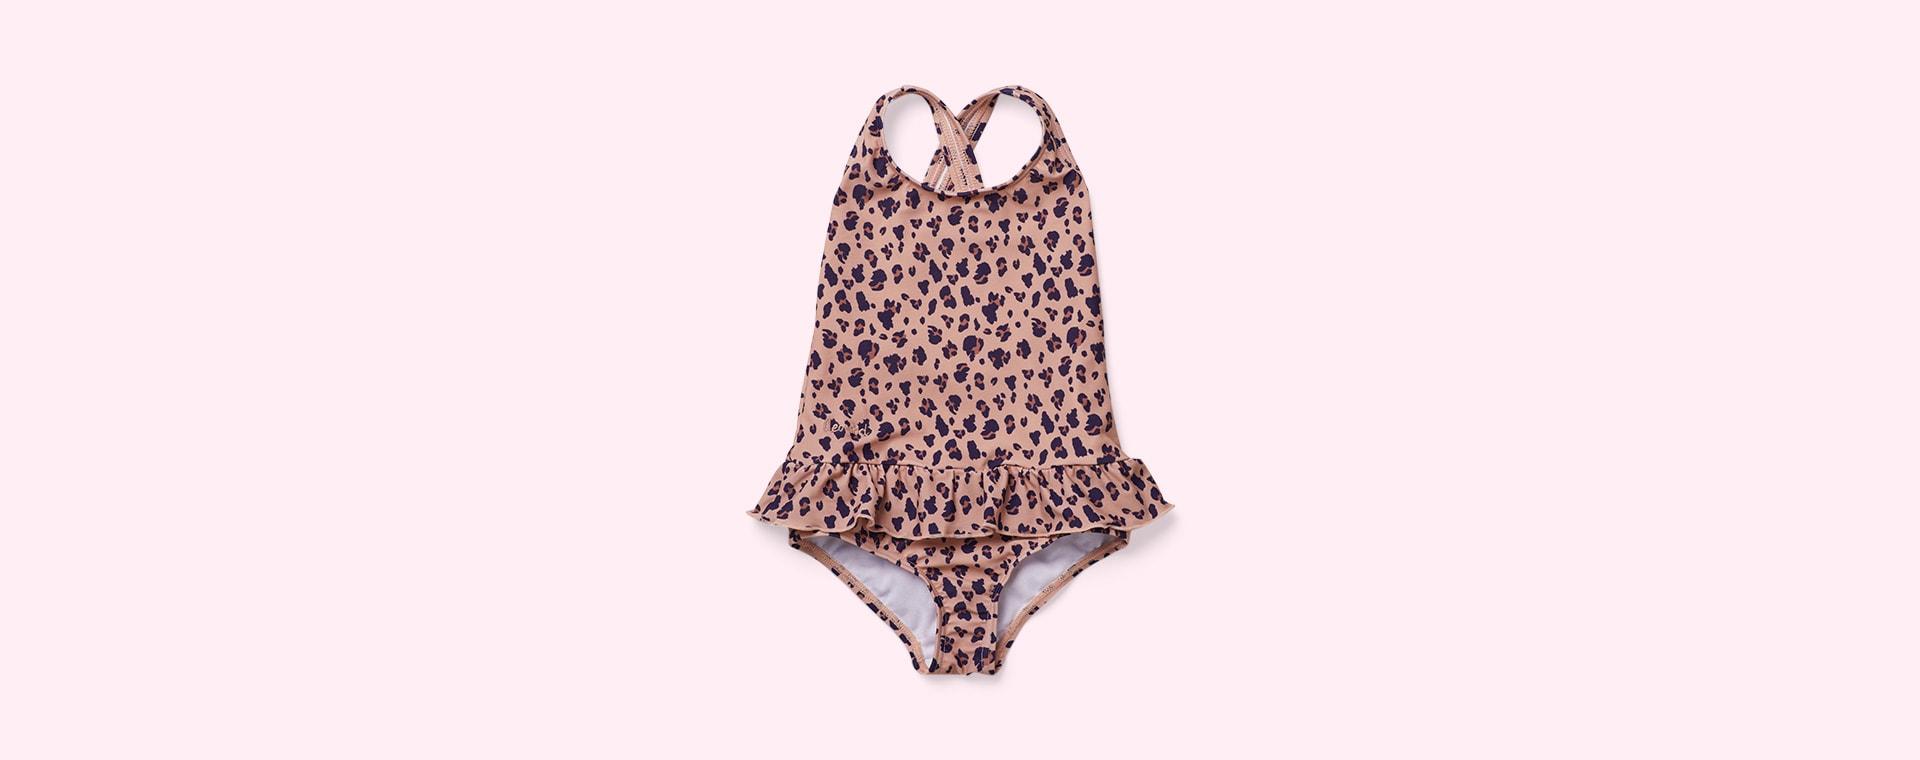 Mini Leo Coral Liewood Amara Swimsuit